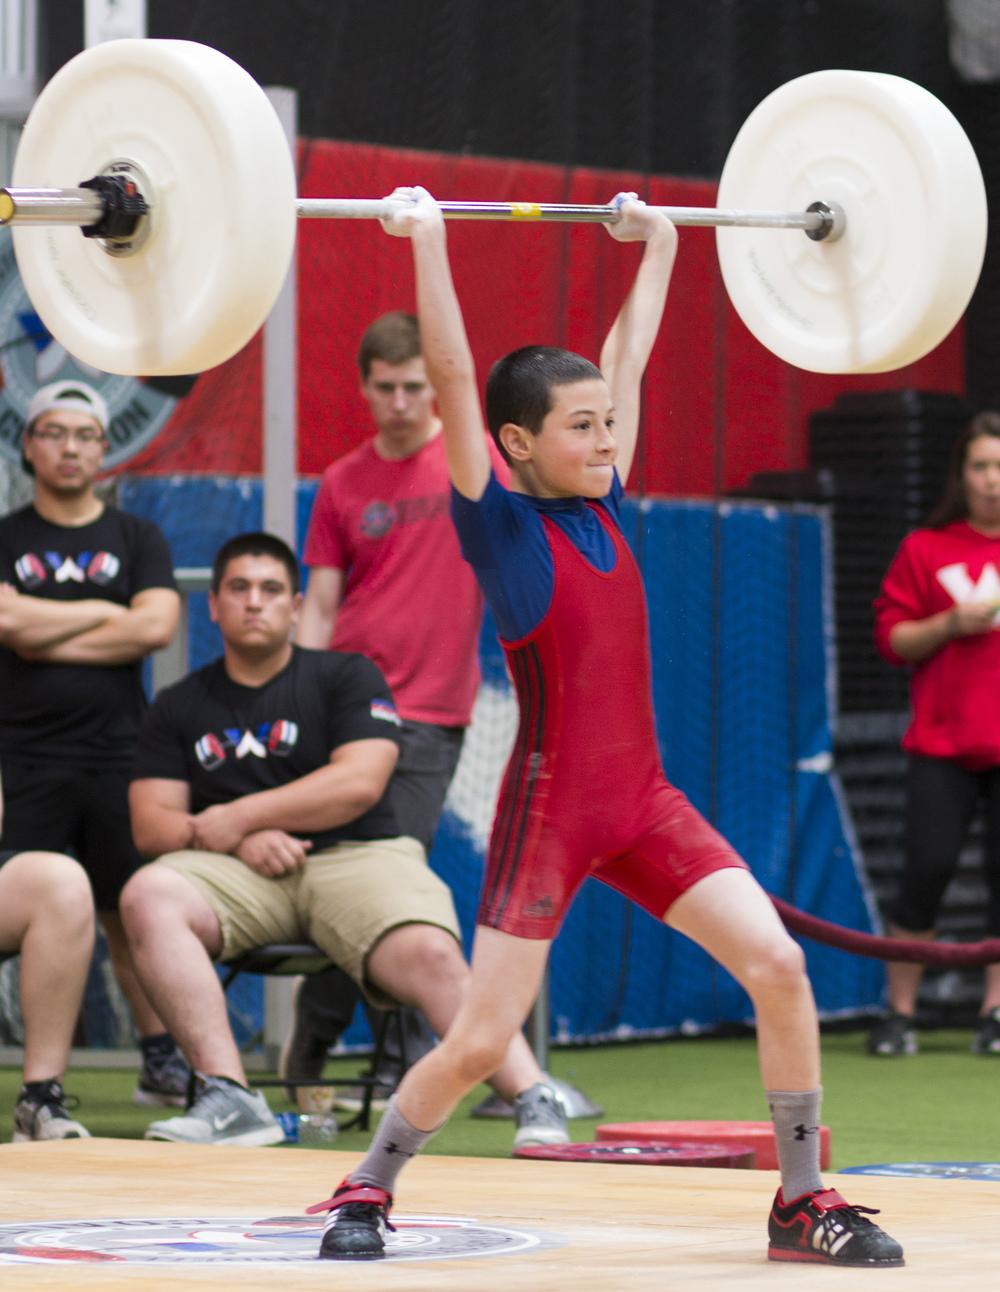 youthweightlifting_bumperplates_usaweightlifting.jpg